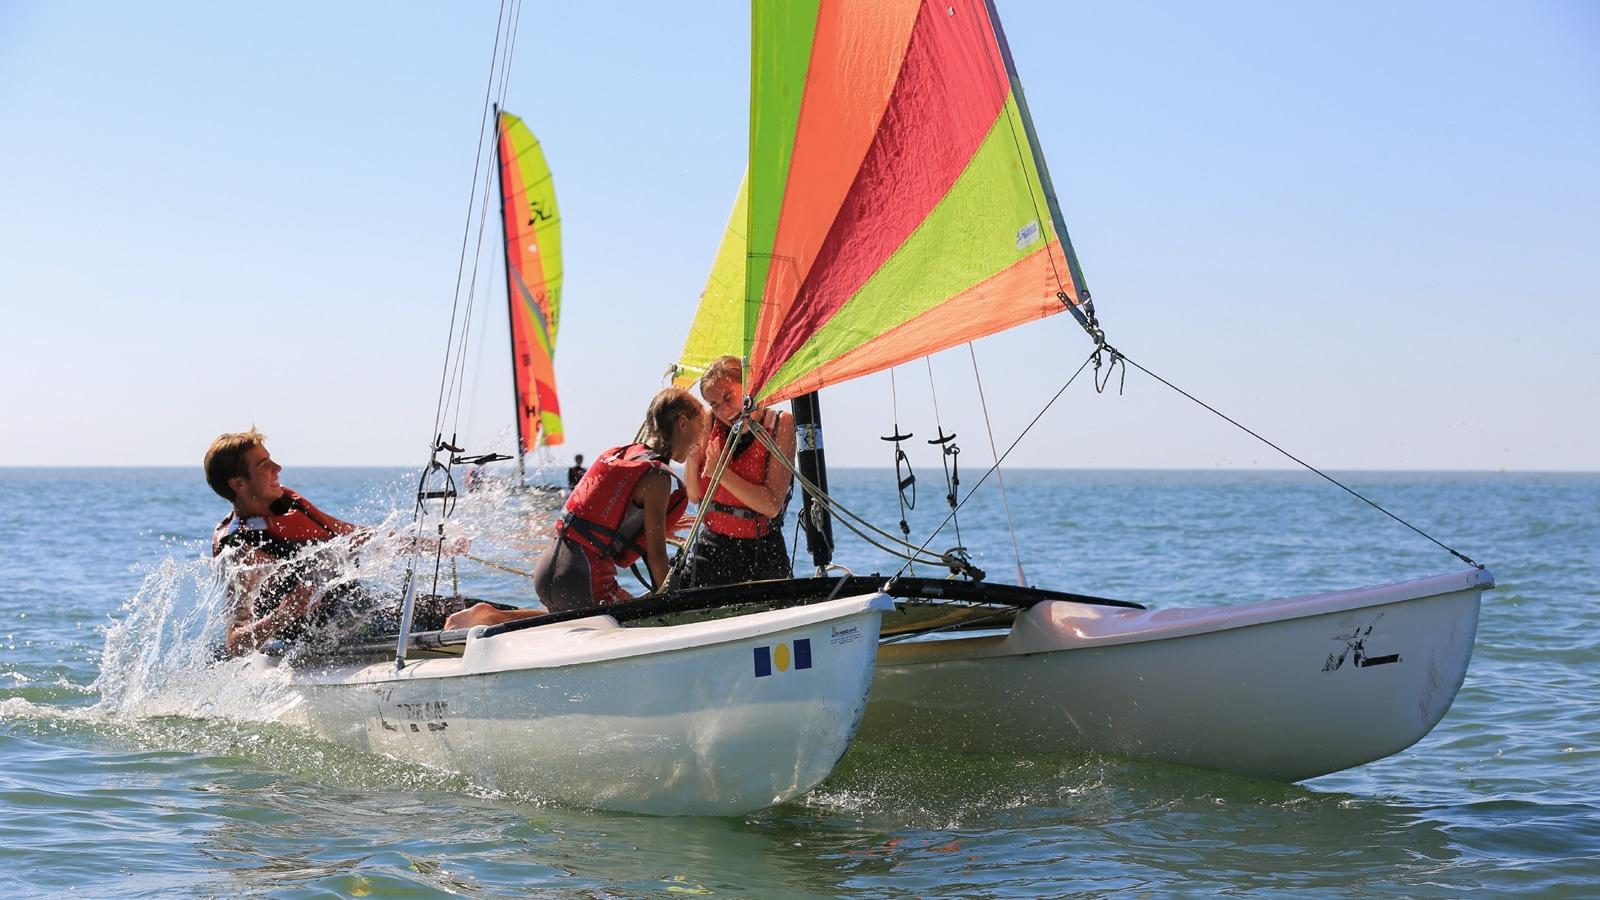 voile-catamaran-vendee-saintjeandemonts